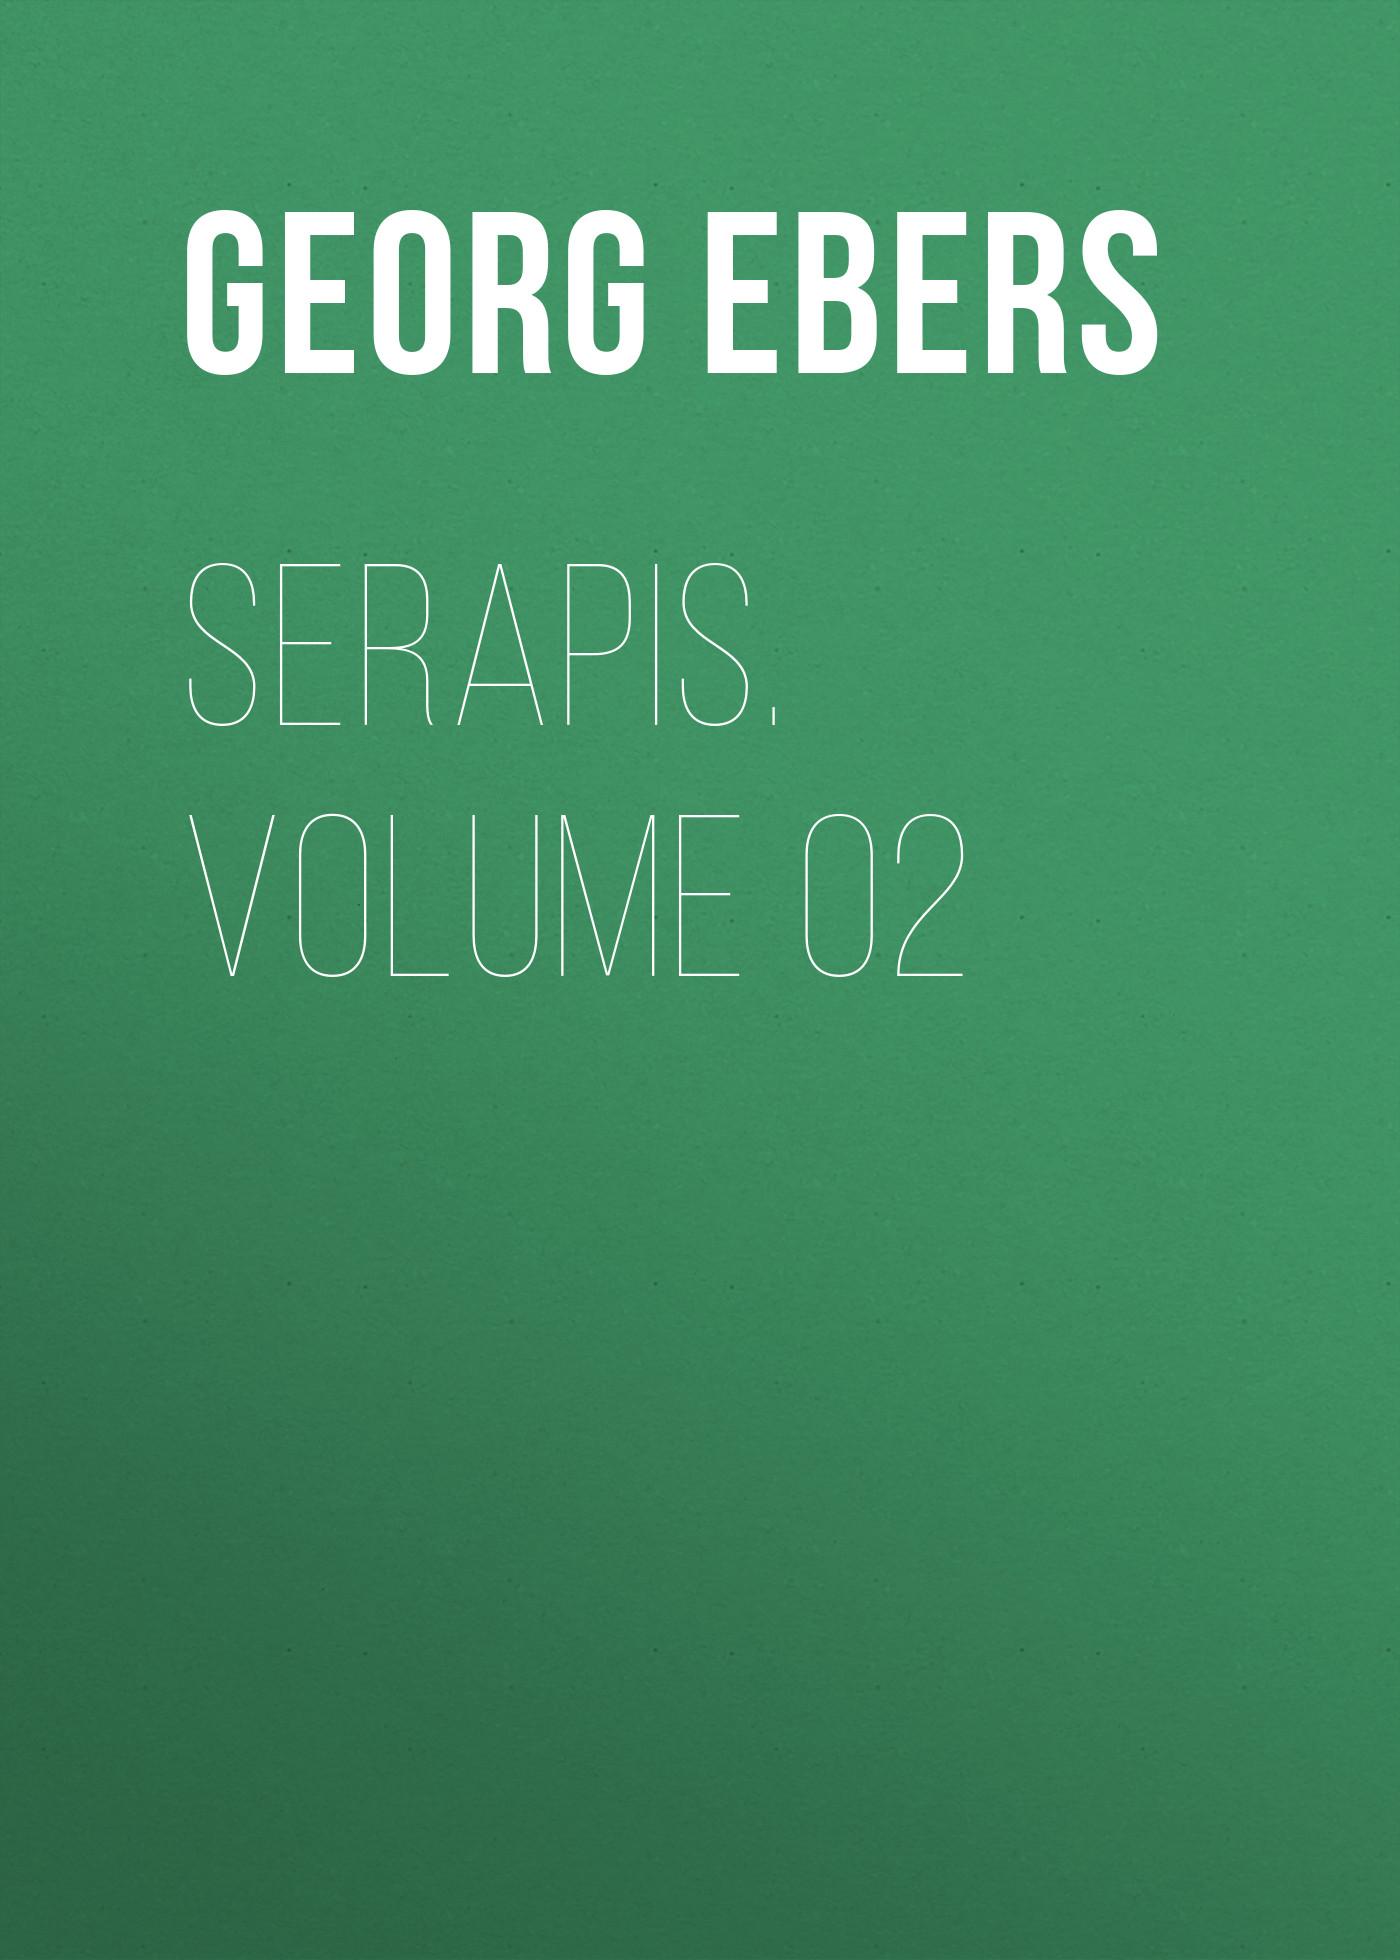 Georg Ebers Serapis. Volume 02 georg ebers homo sum volume 02